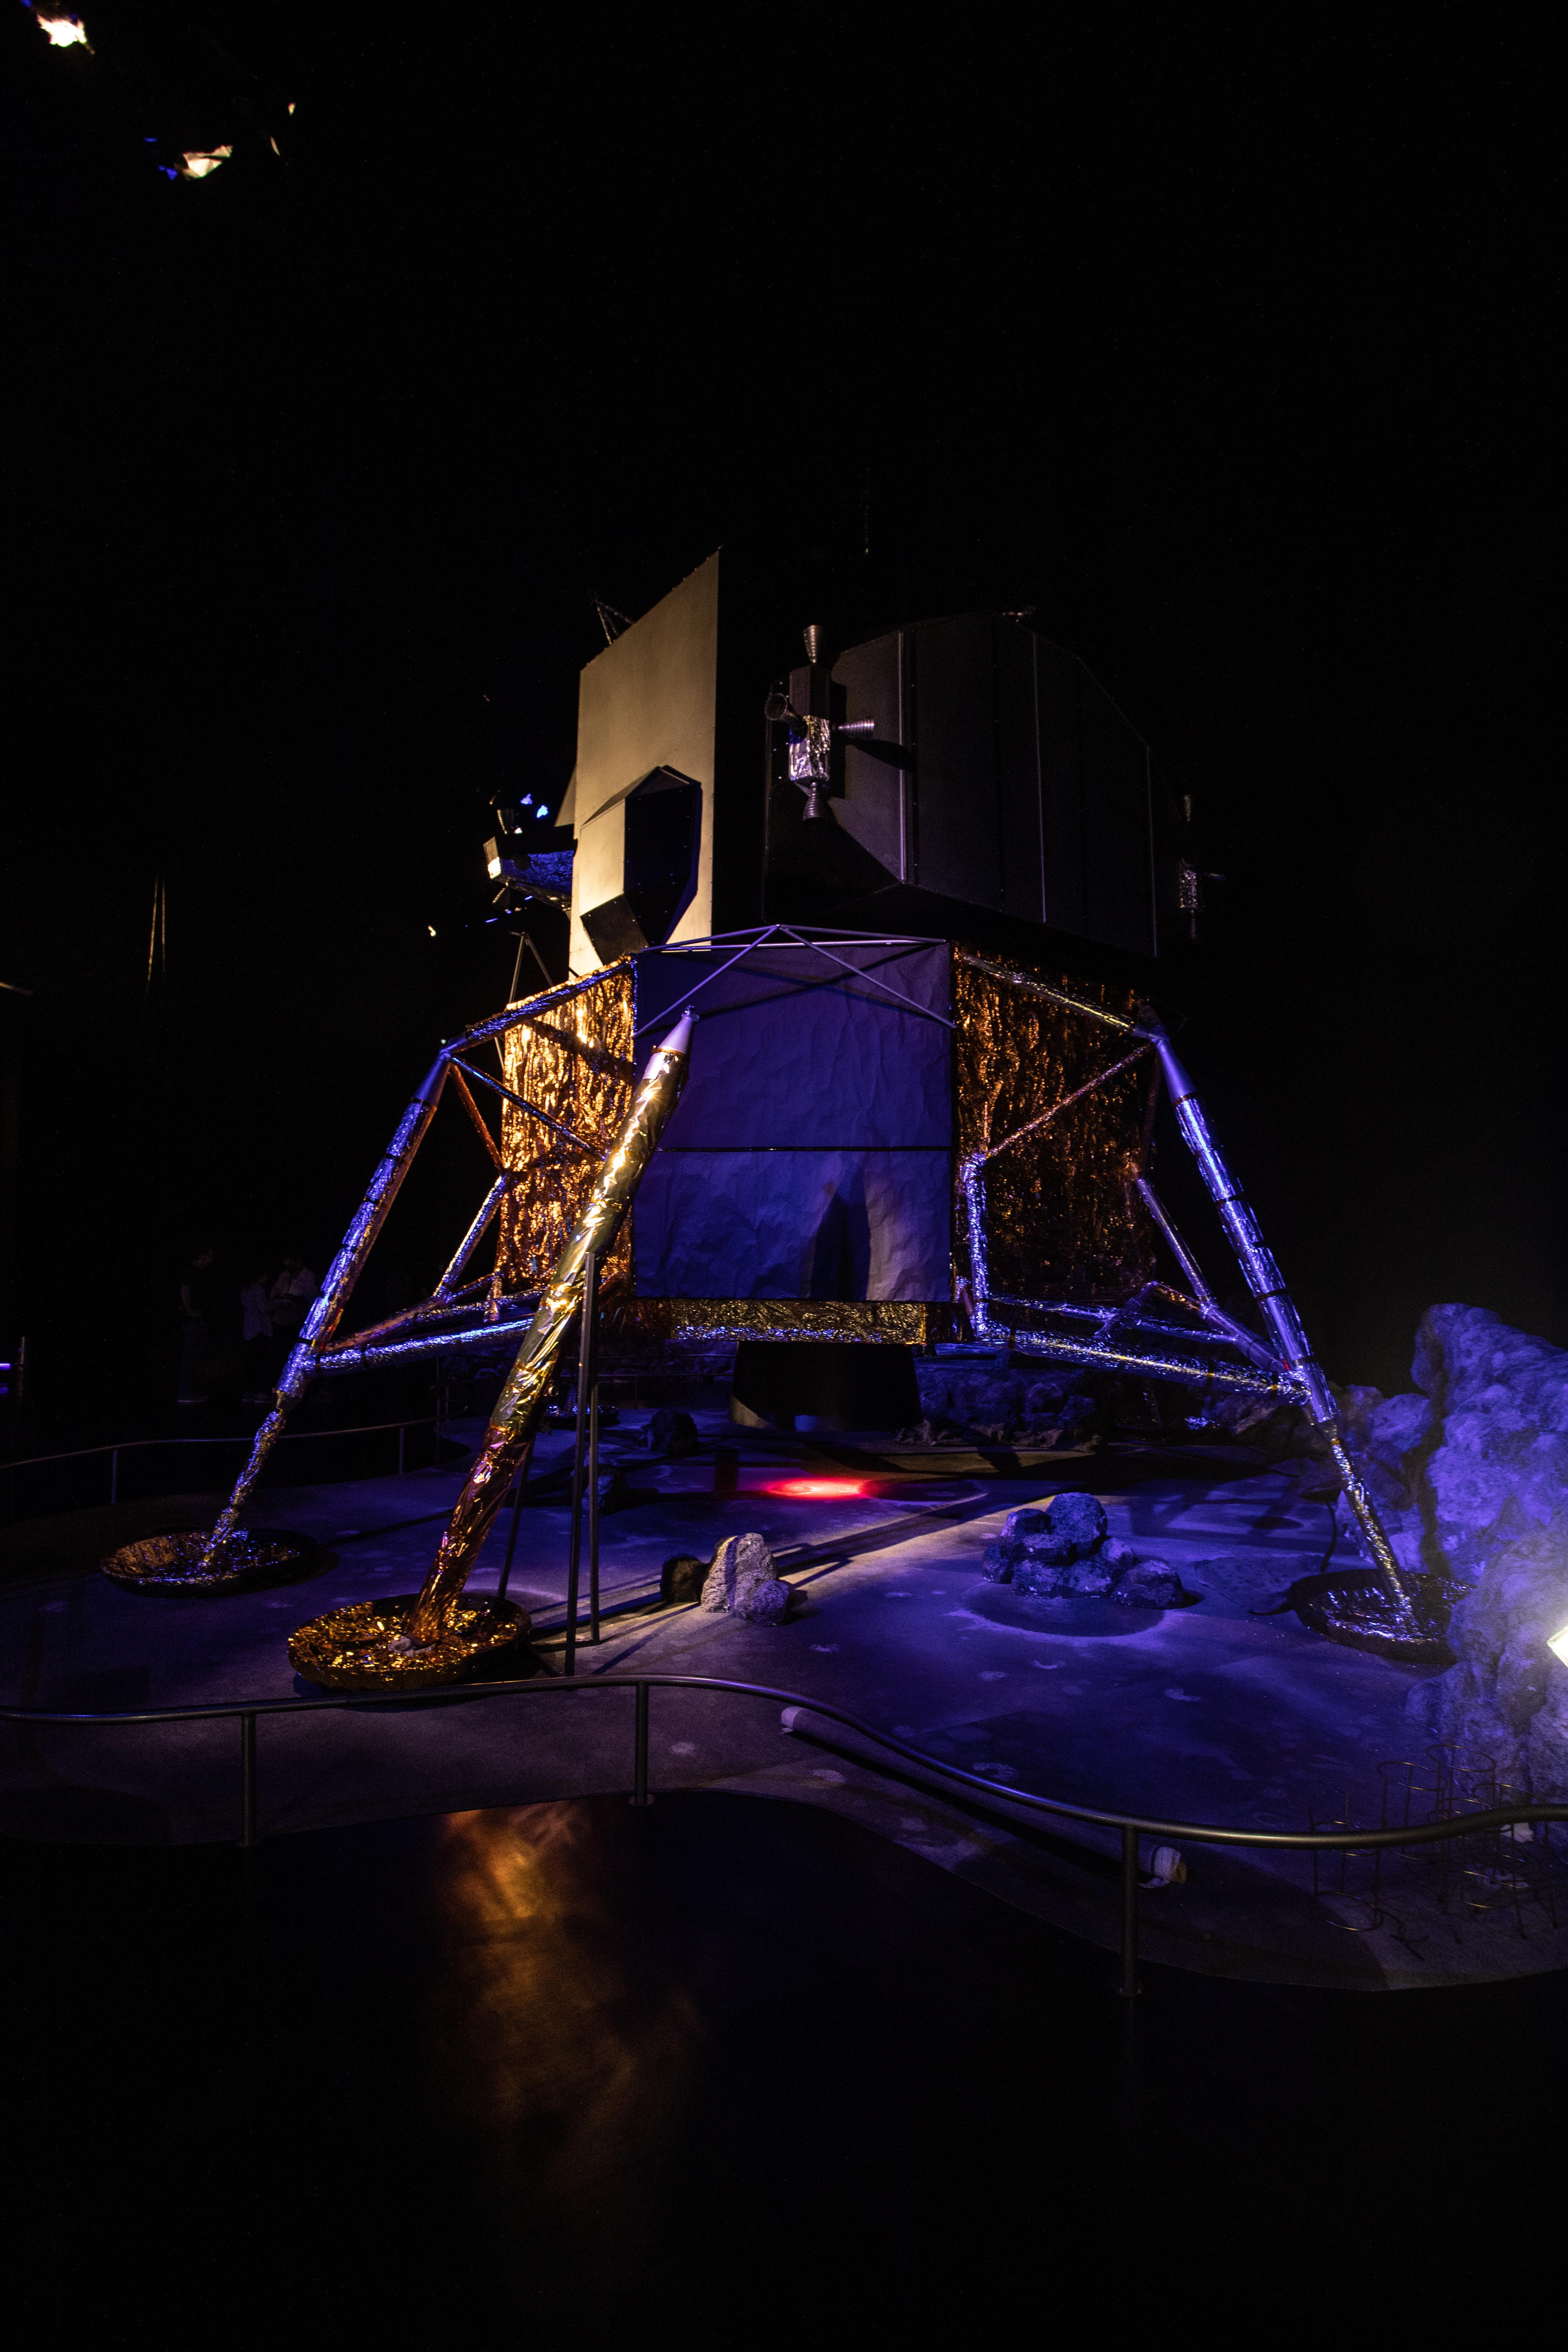 Veículo lunar aparece em ambiente escuro.